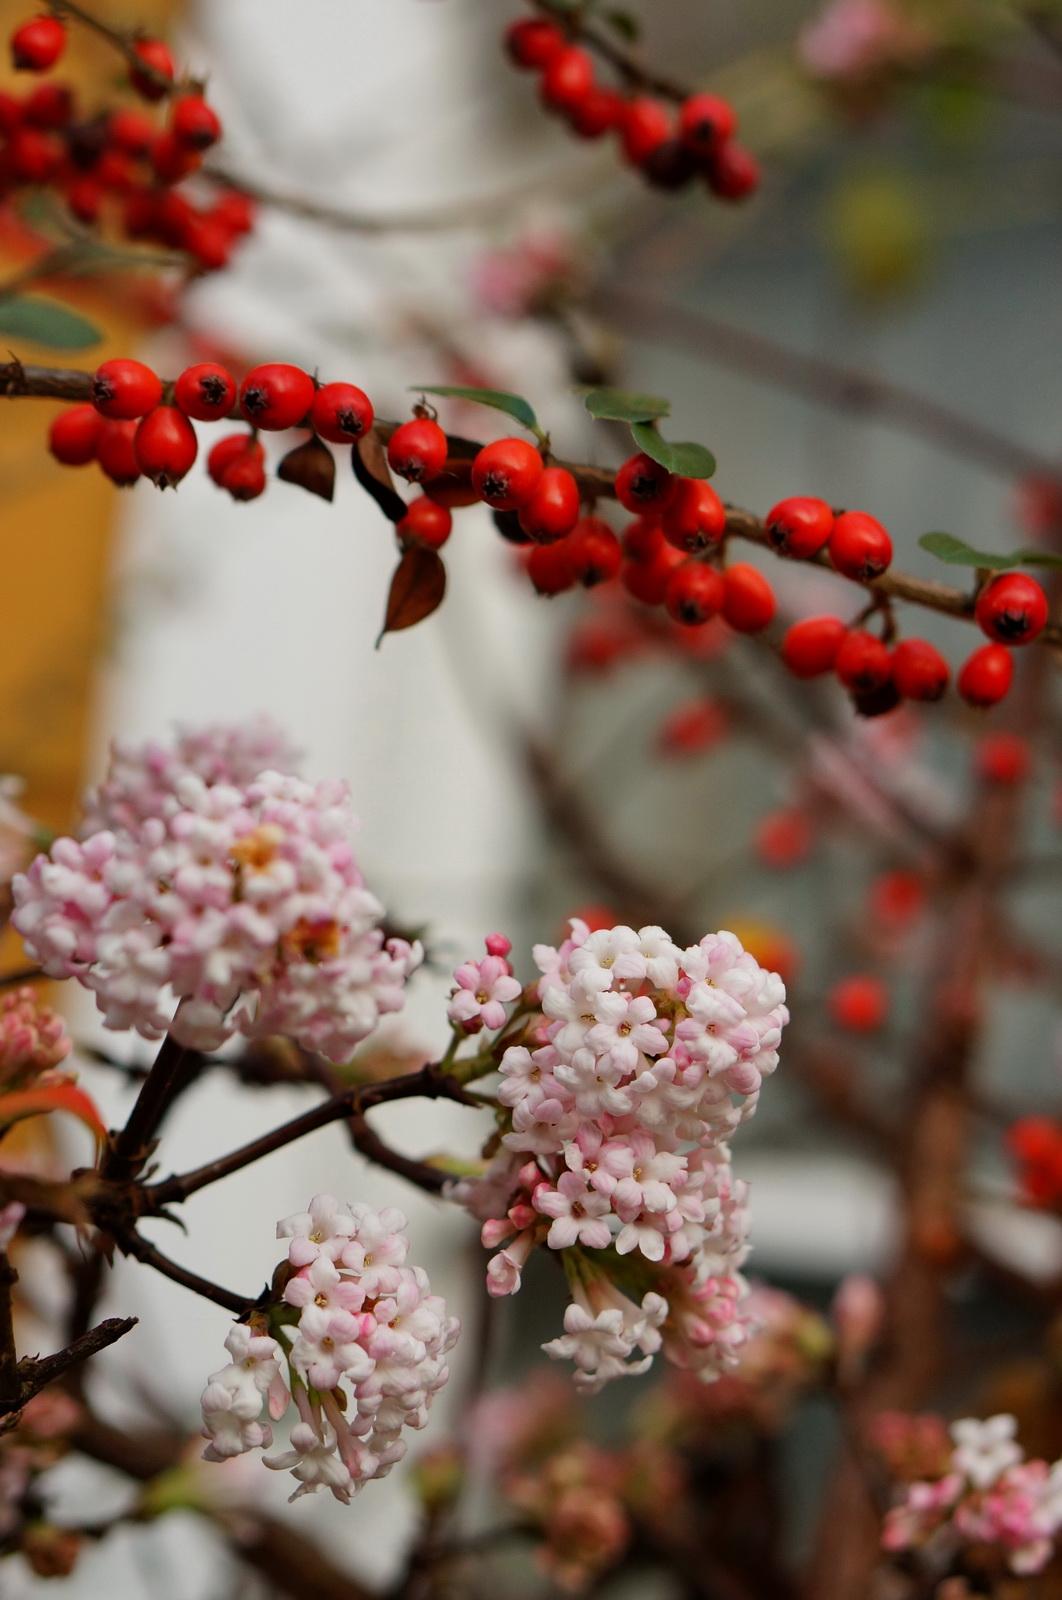 Mi-hiver, mi-printemps !